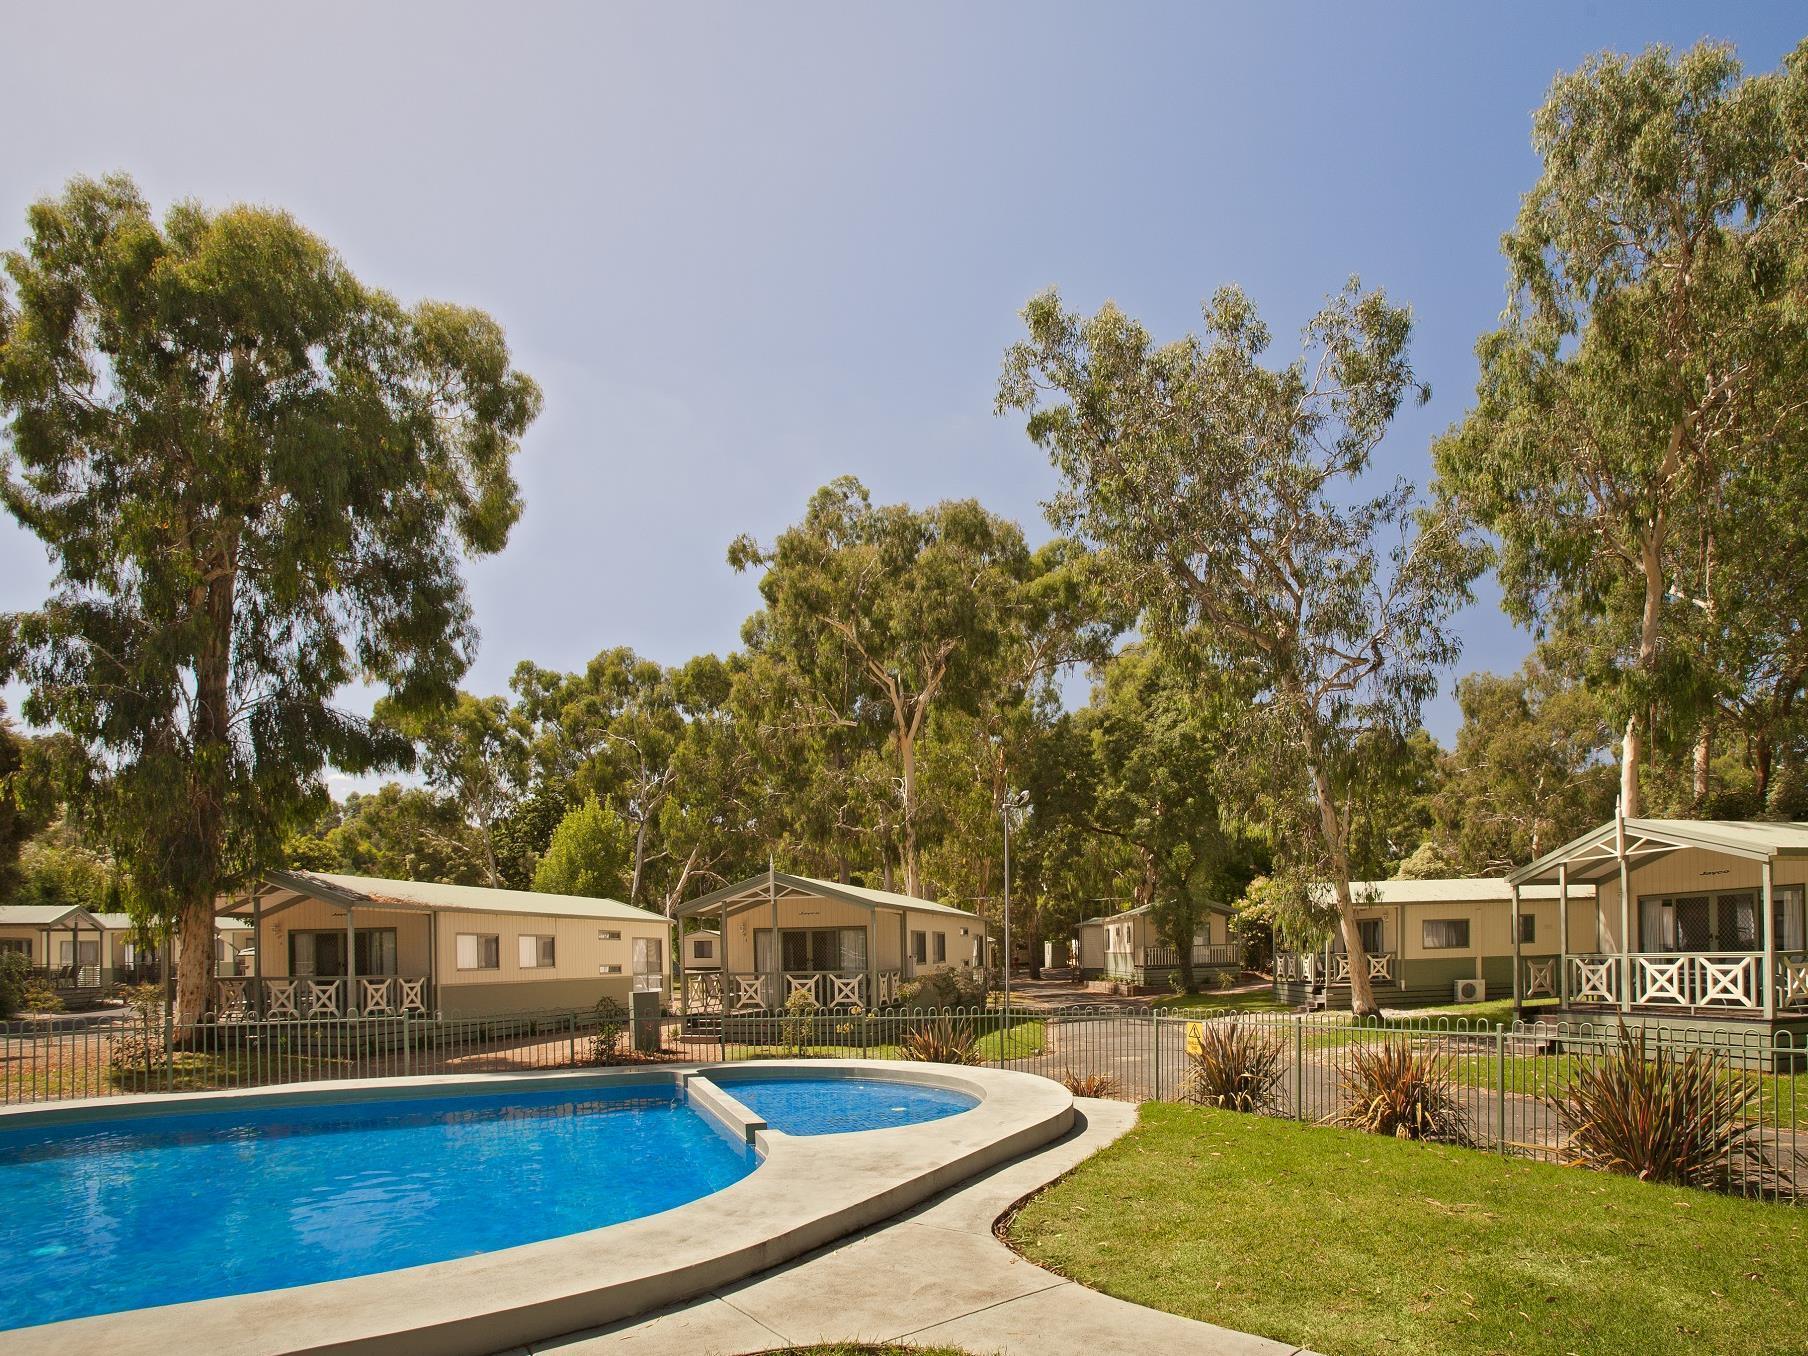 Crystal Brook Tourist Park Hotel